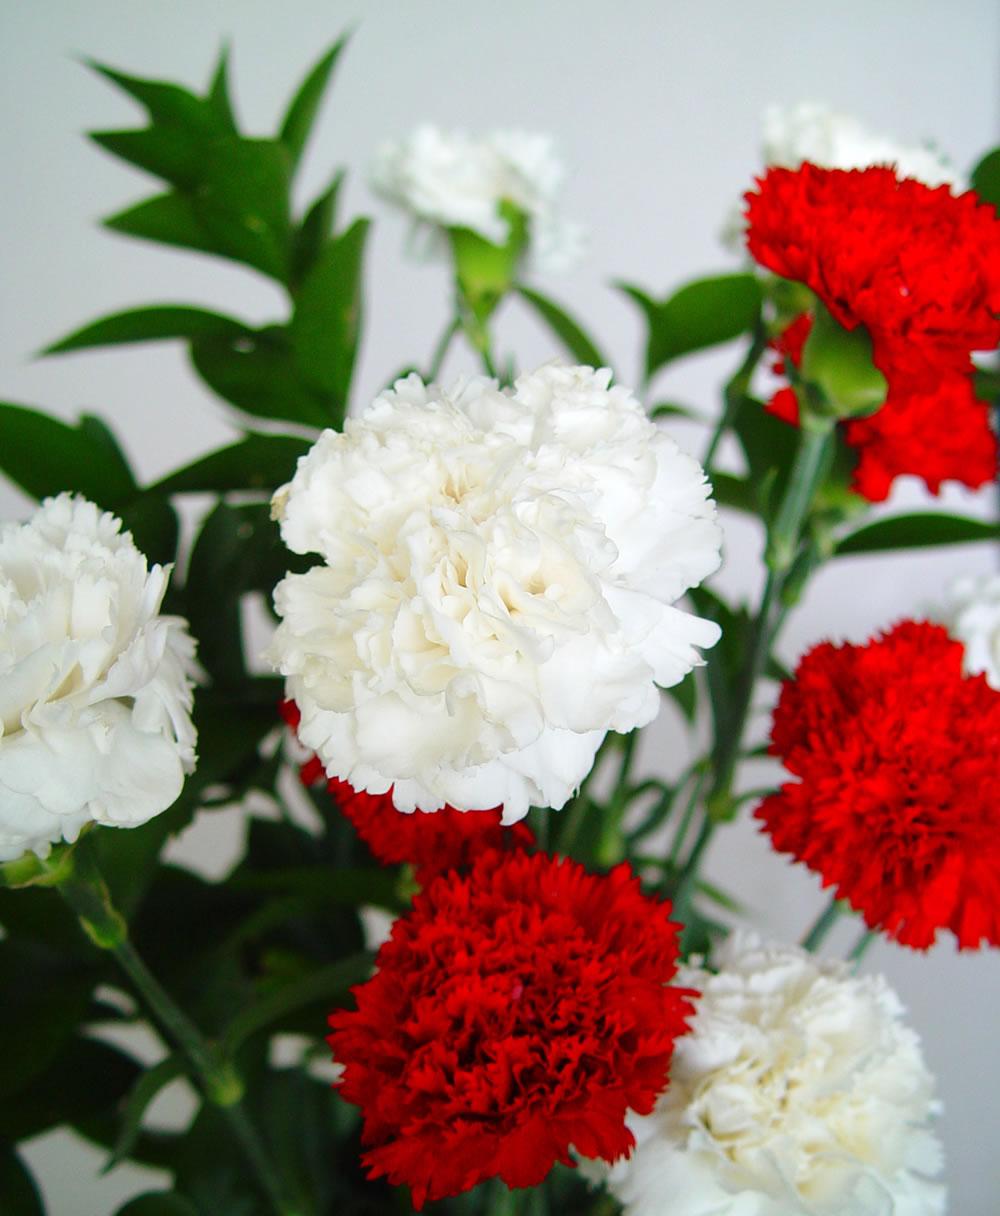 Chistes de abogados claveles for Plantas ornamentales clavel